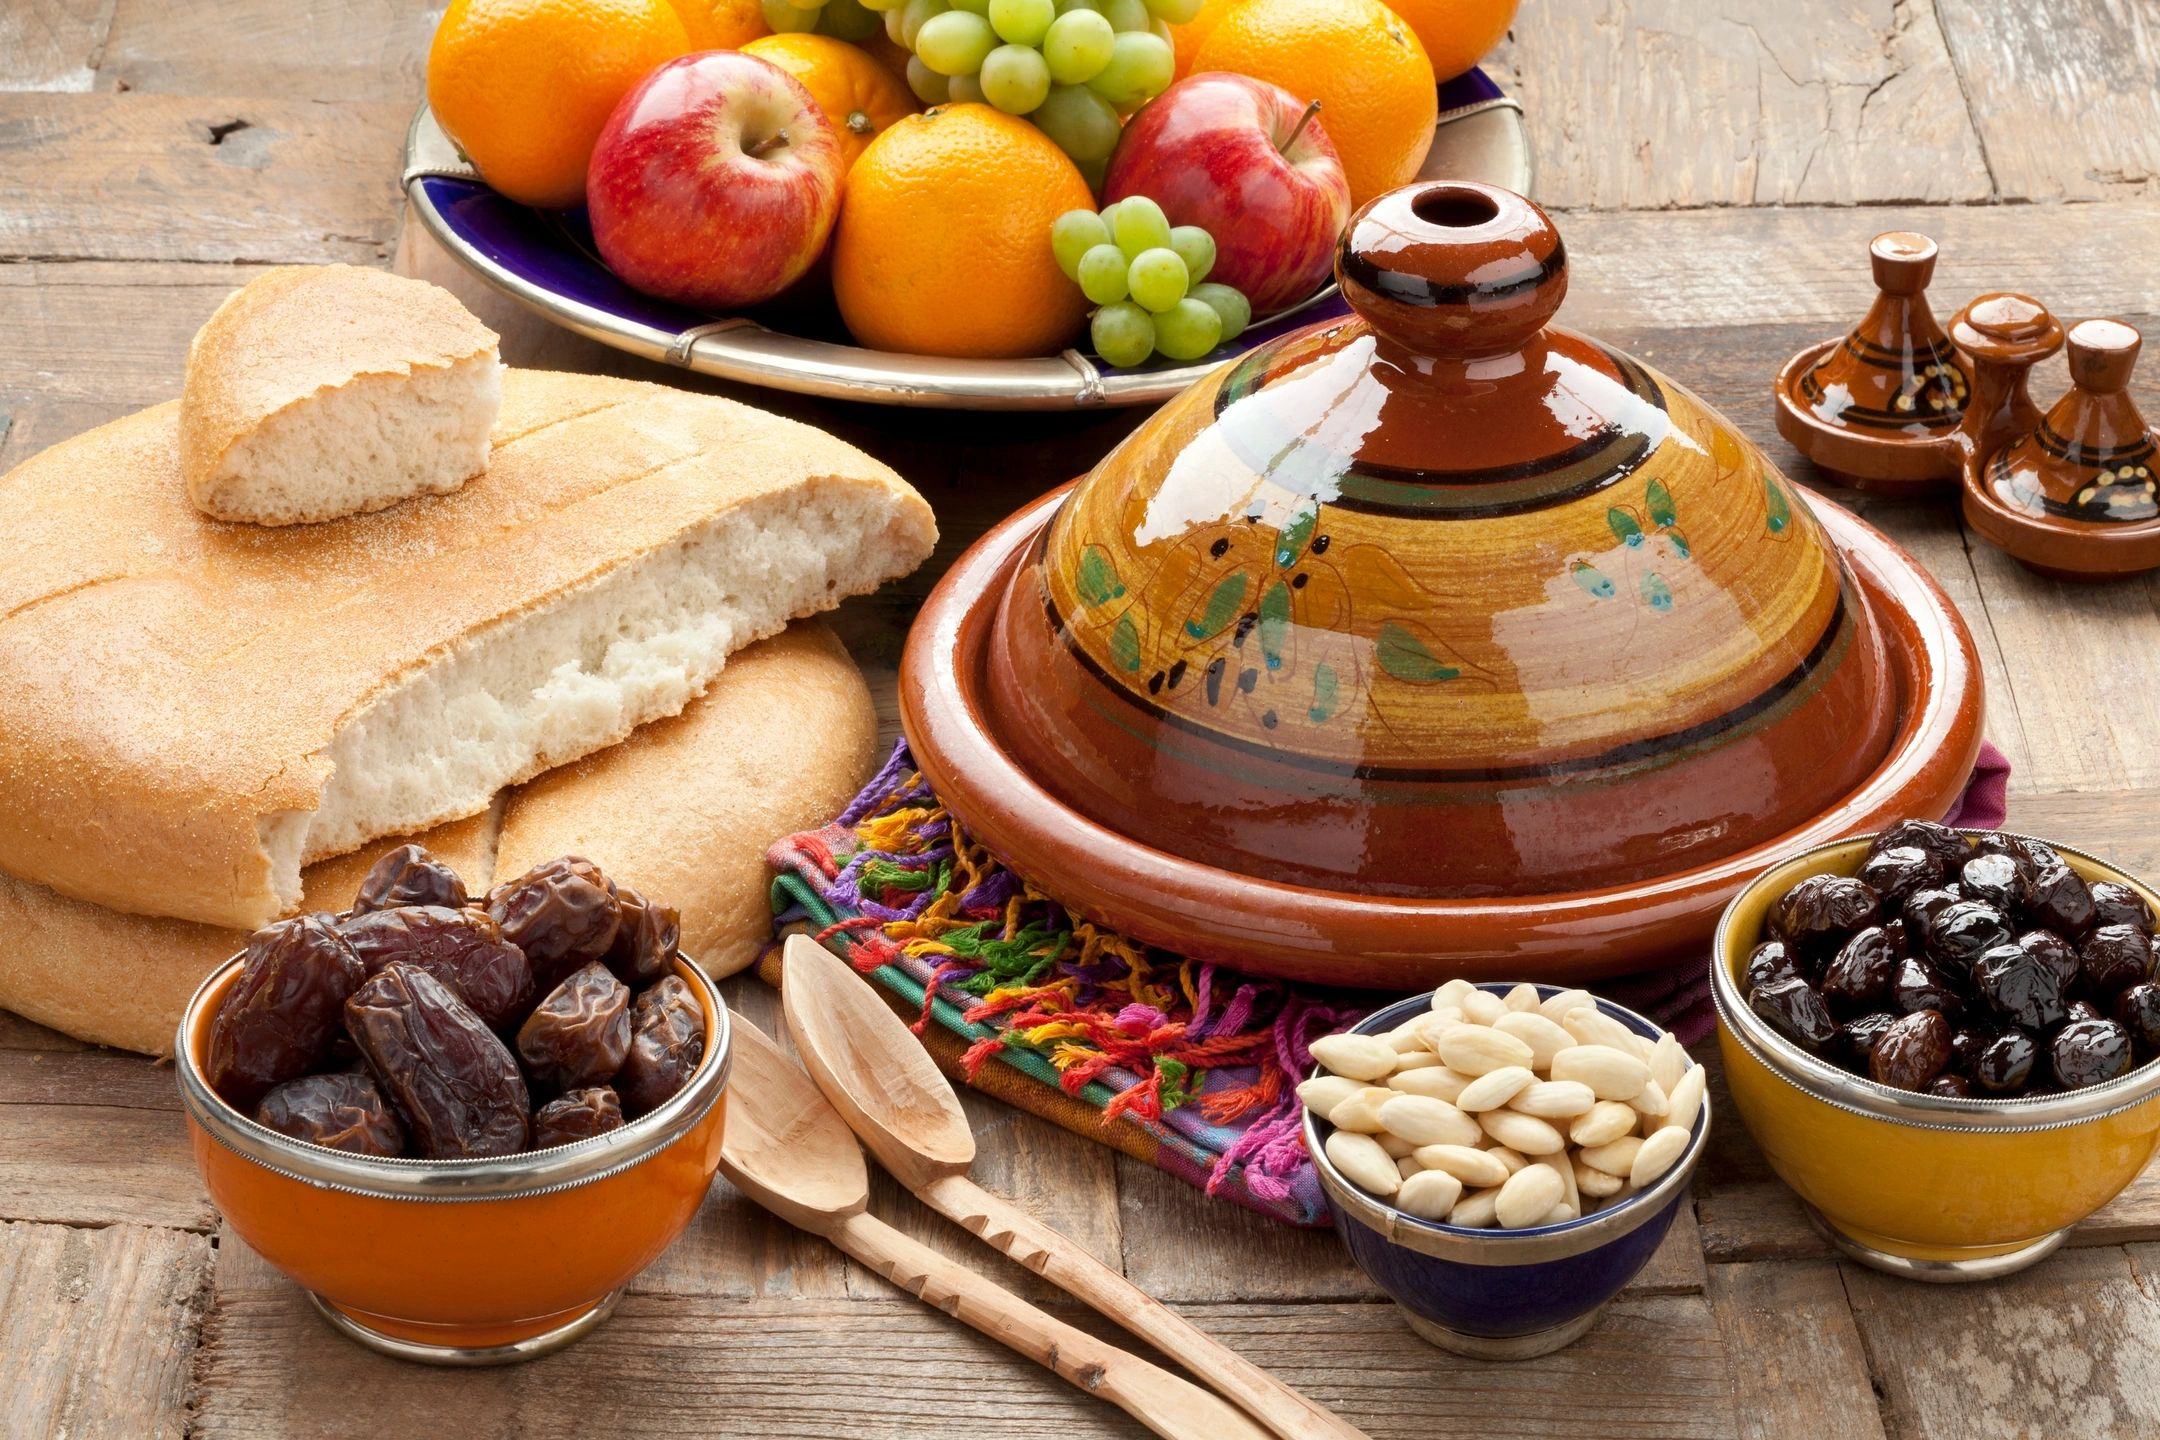 Book Of Fasting – Shaykh Saalih' ibnul Uthaymeen